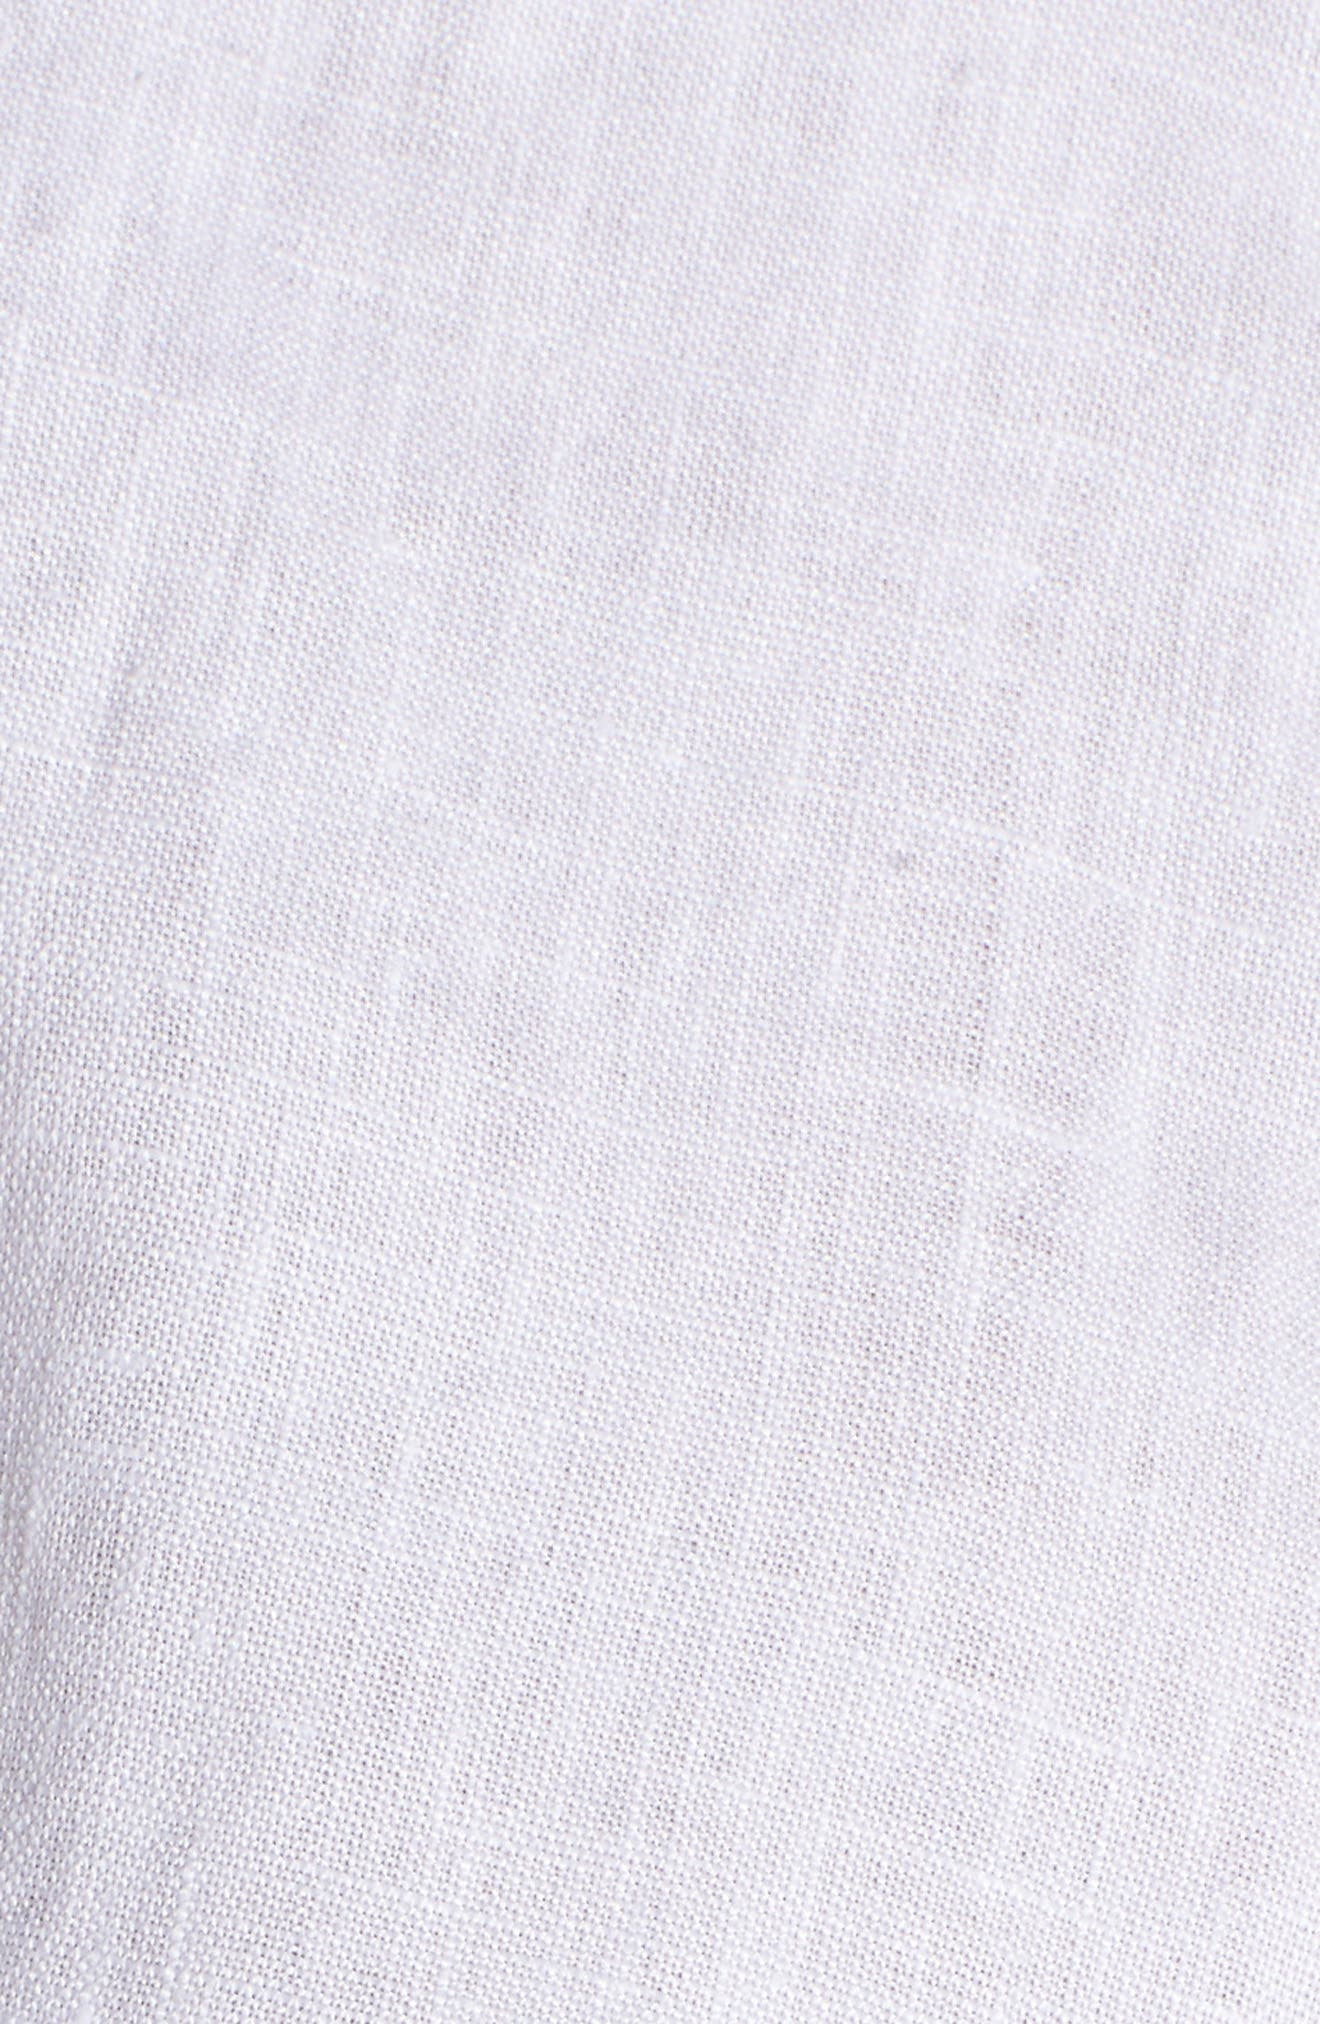 Linen Chambray Shirt,                             Alternate thumbnail 31, color,